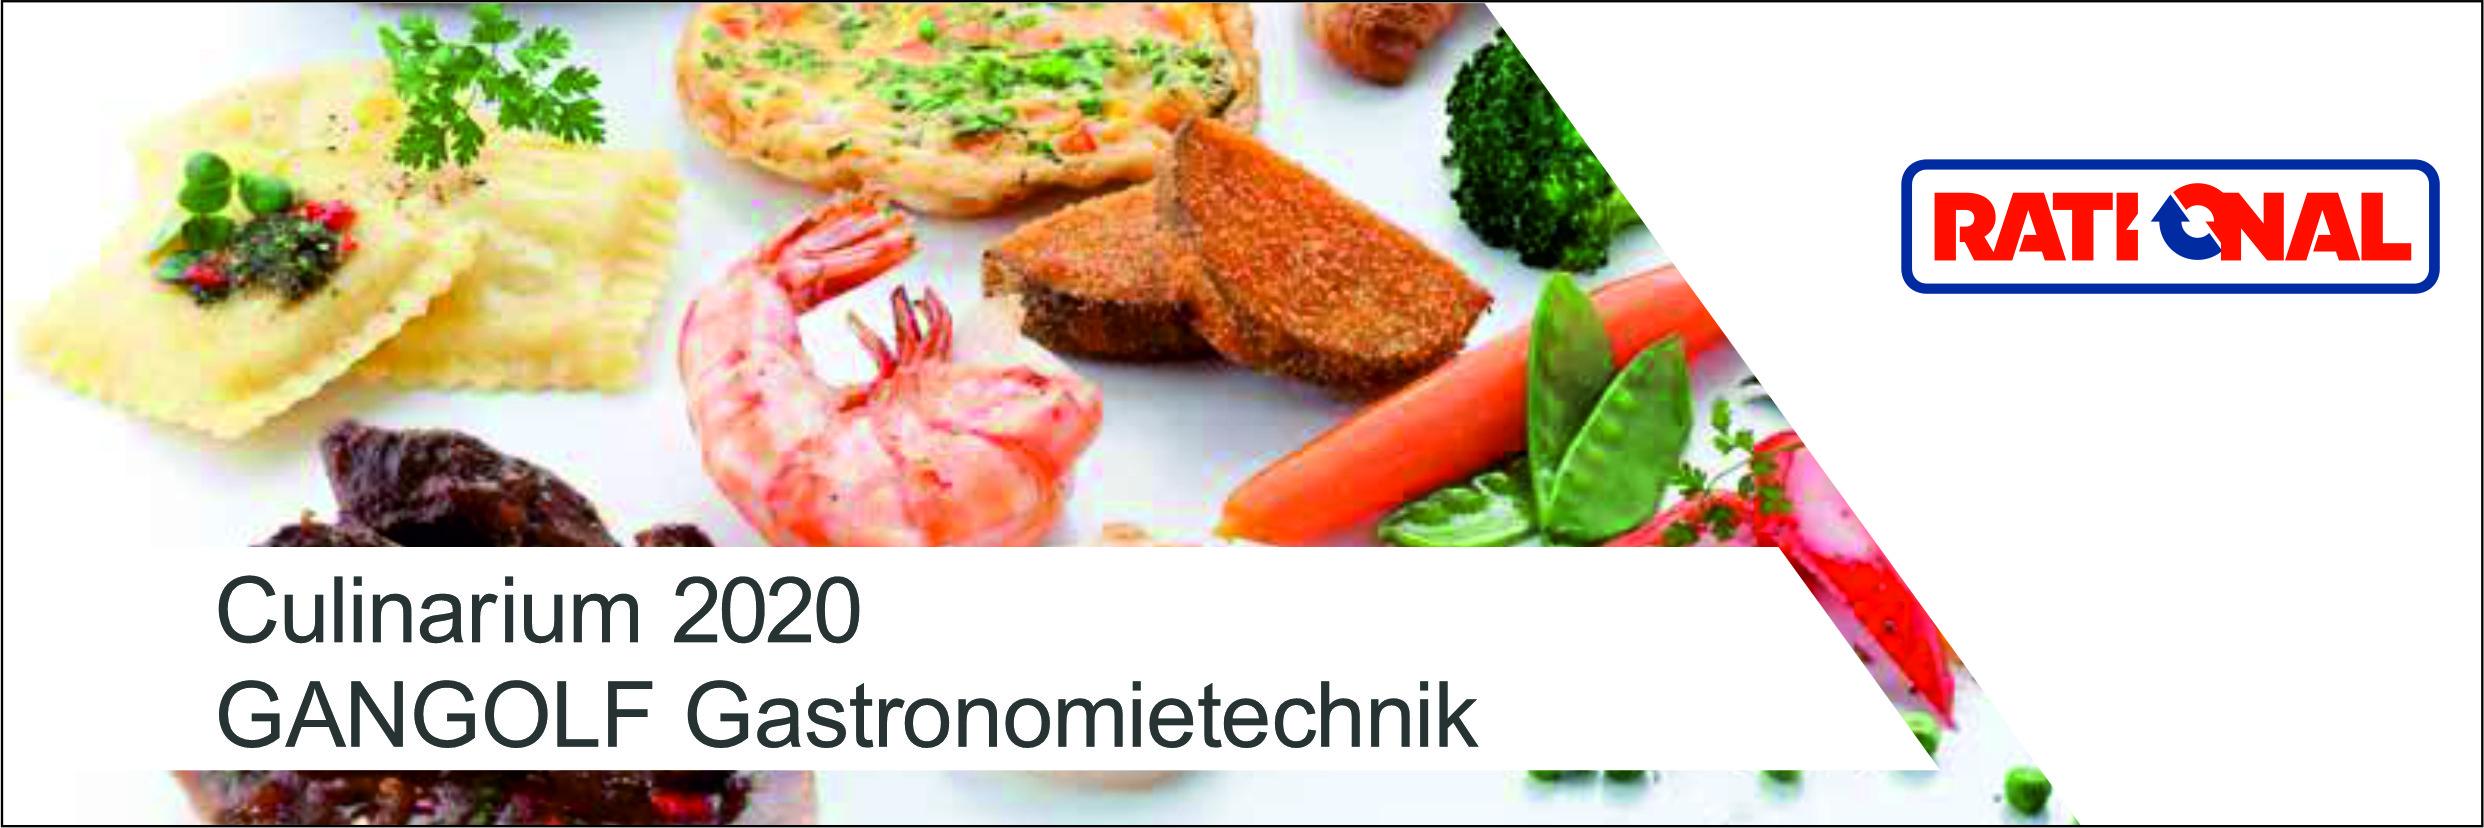 Culinarium 2020 - RATIONAL live erleben.